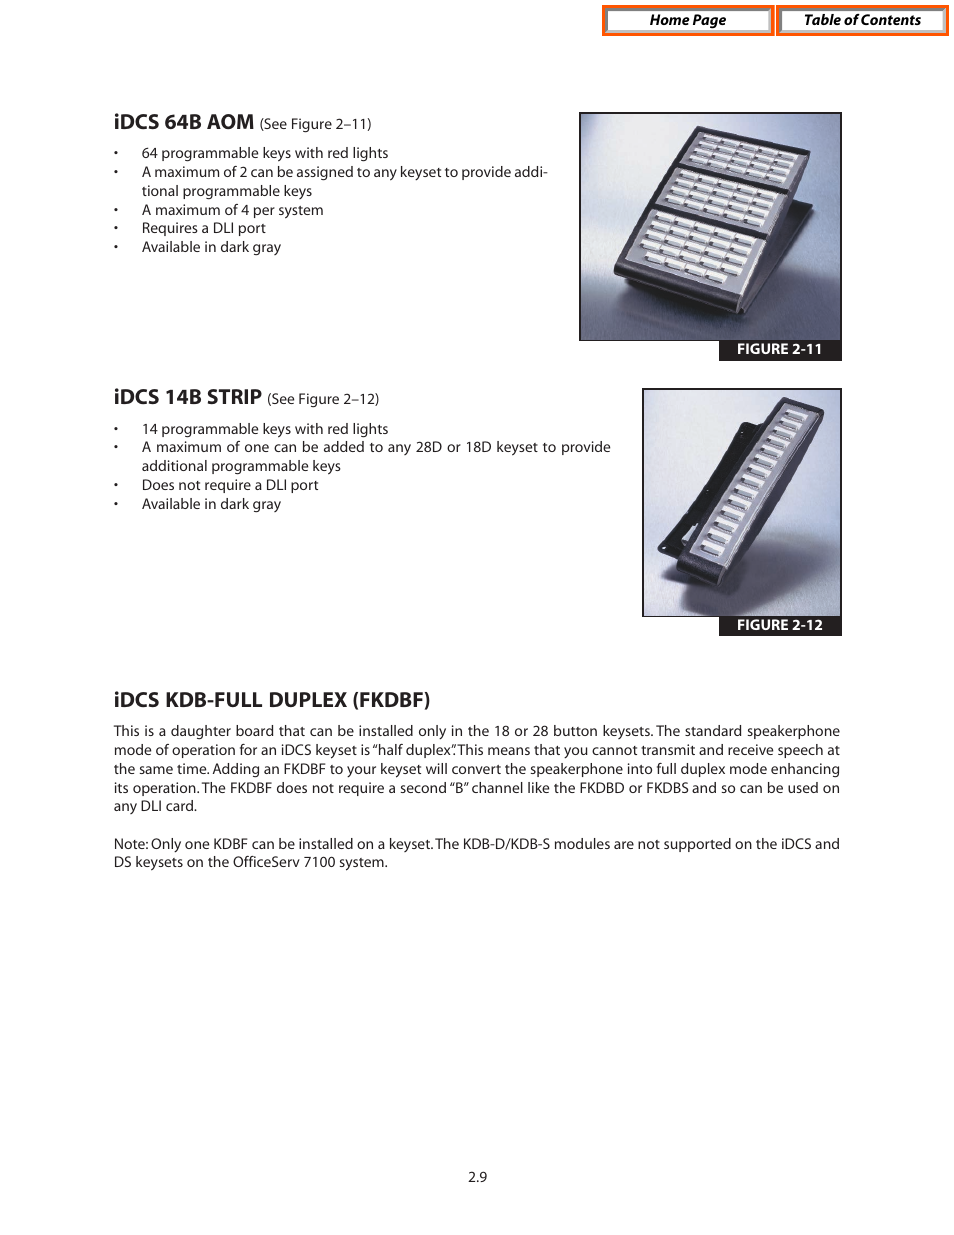 Samsung 7100 series manuals.